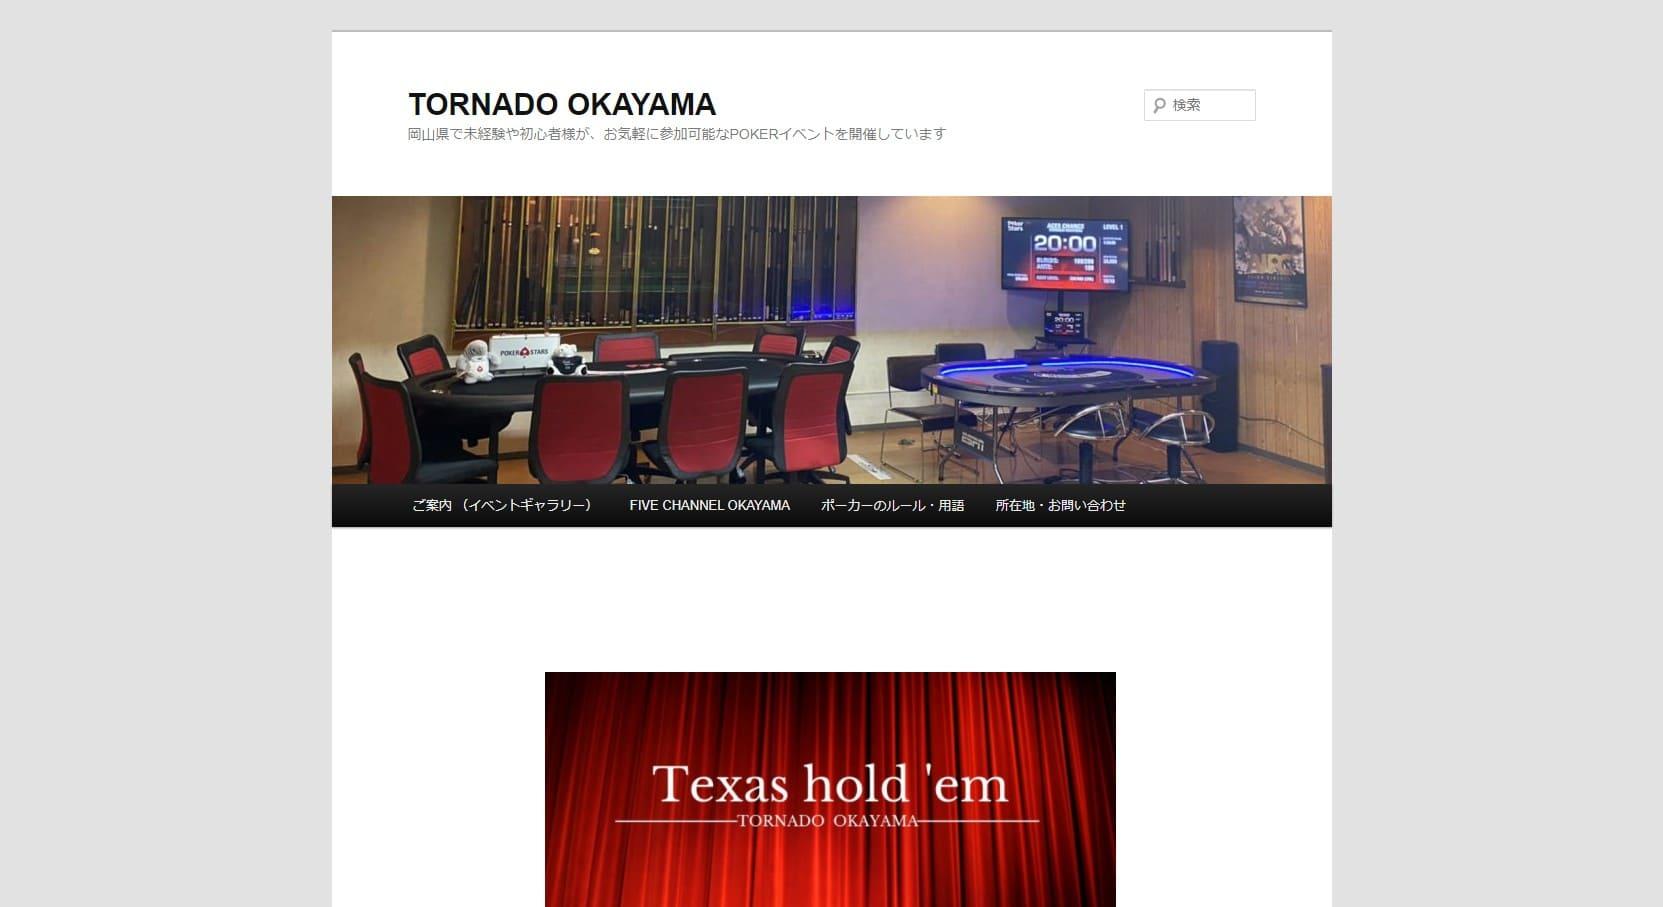 TORNADO OKAYAMAのウェブサイト画像。